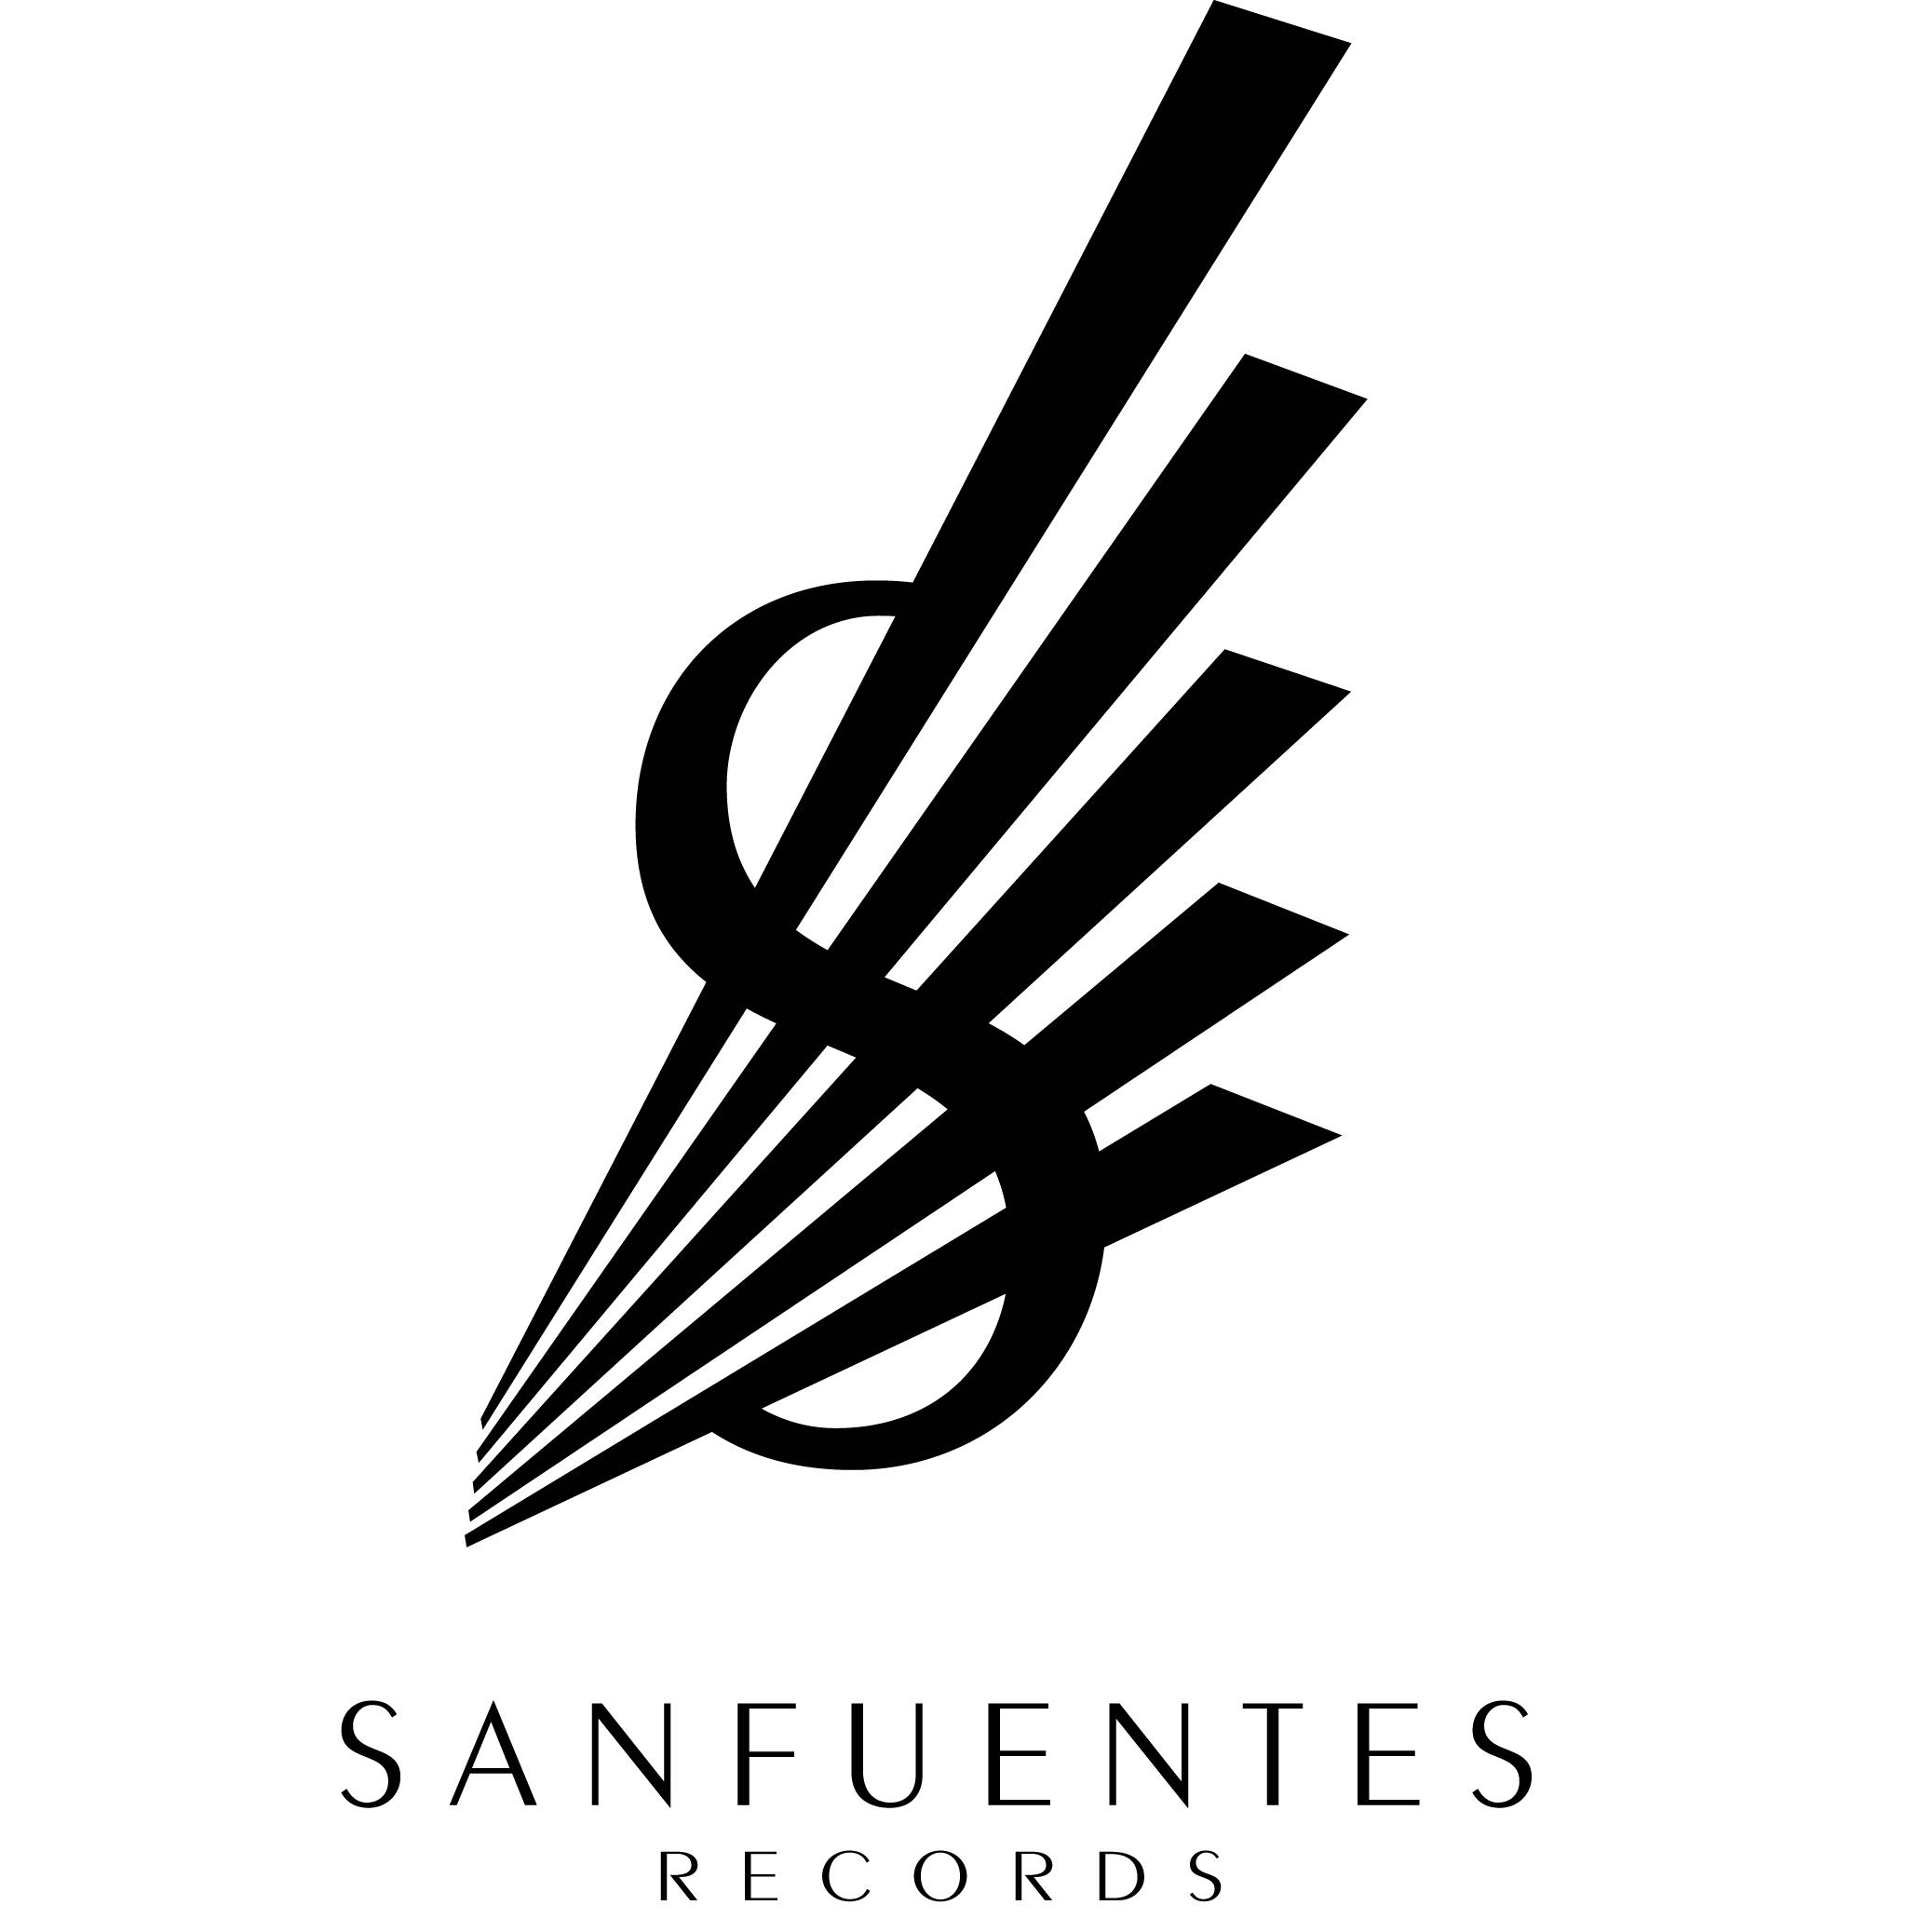 Sanfuentes Records